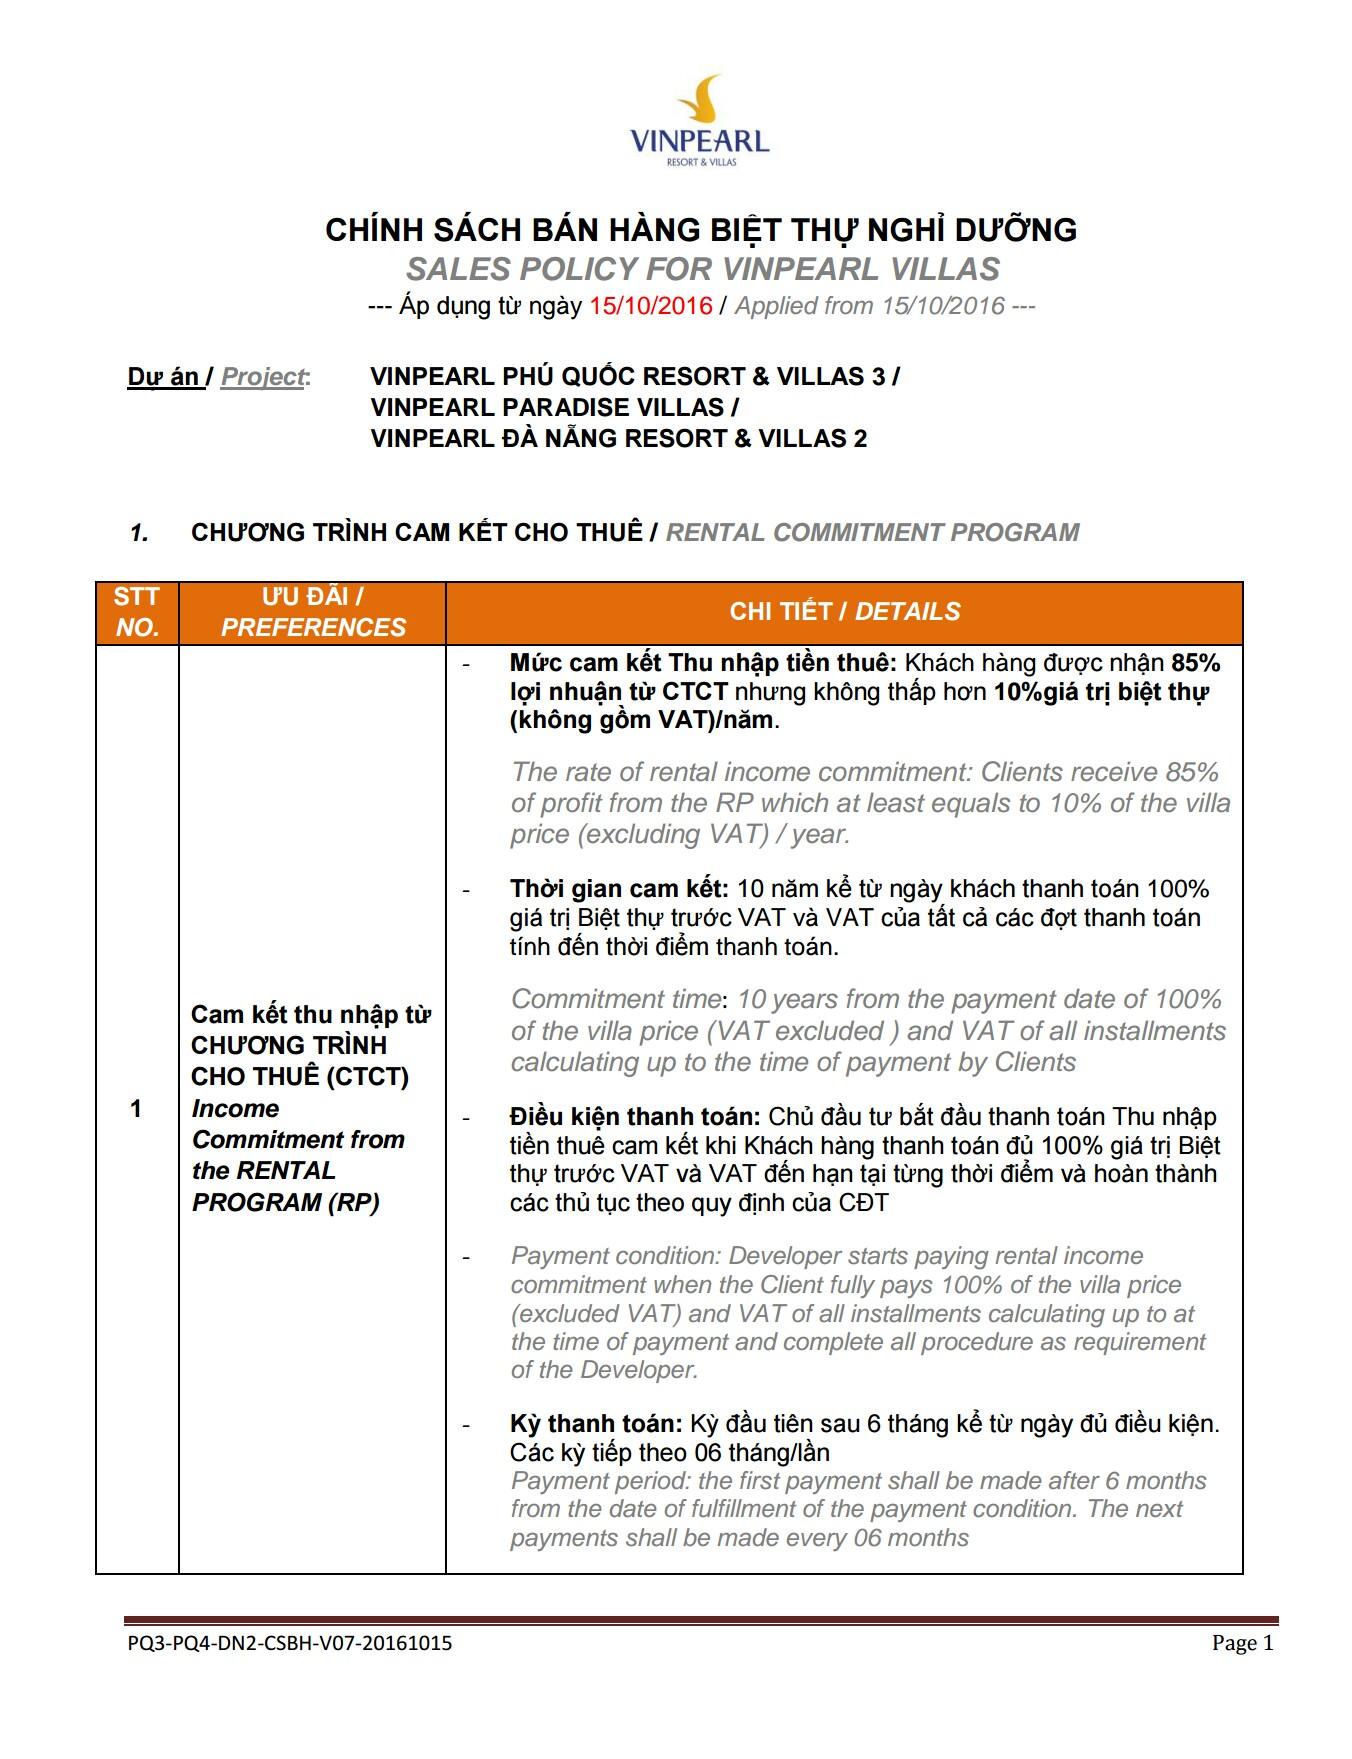 chinh sach ban hang du an vinpearl phu quoc